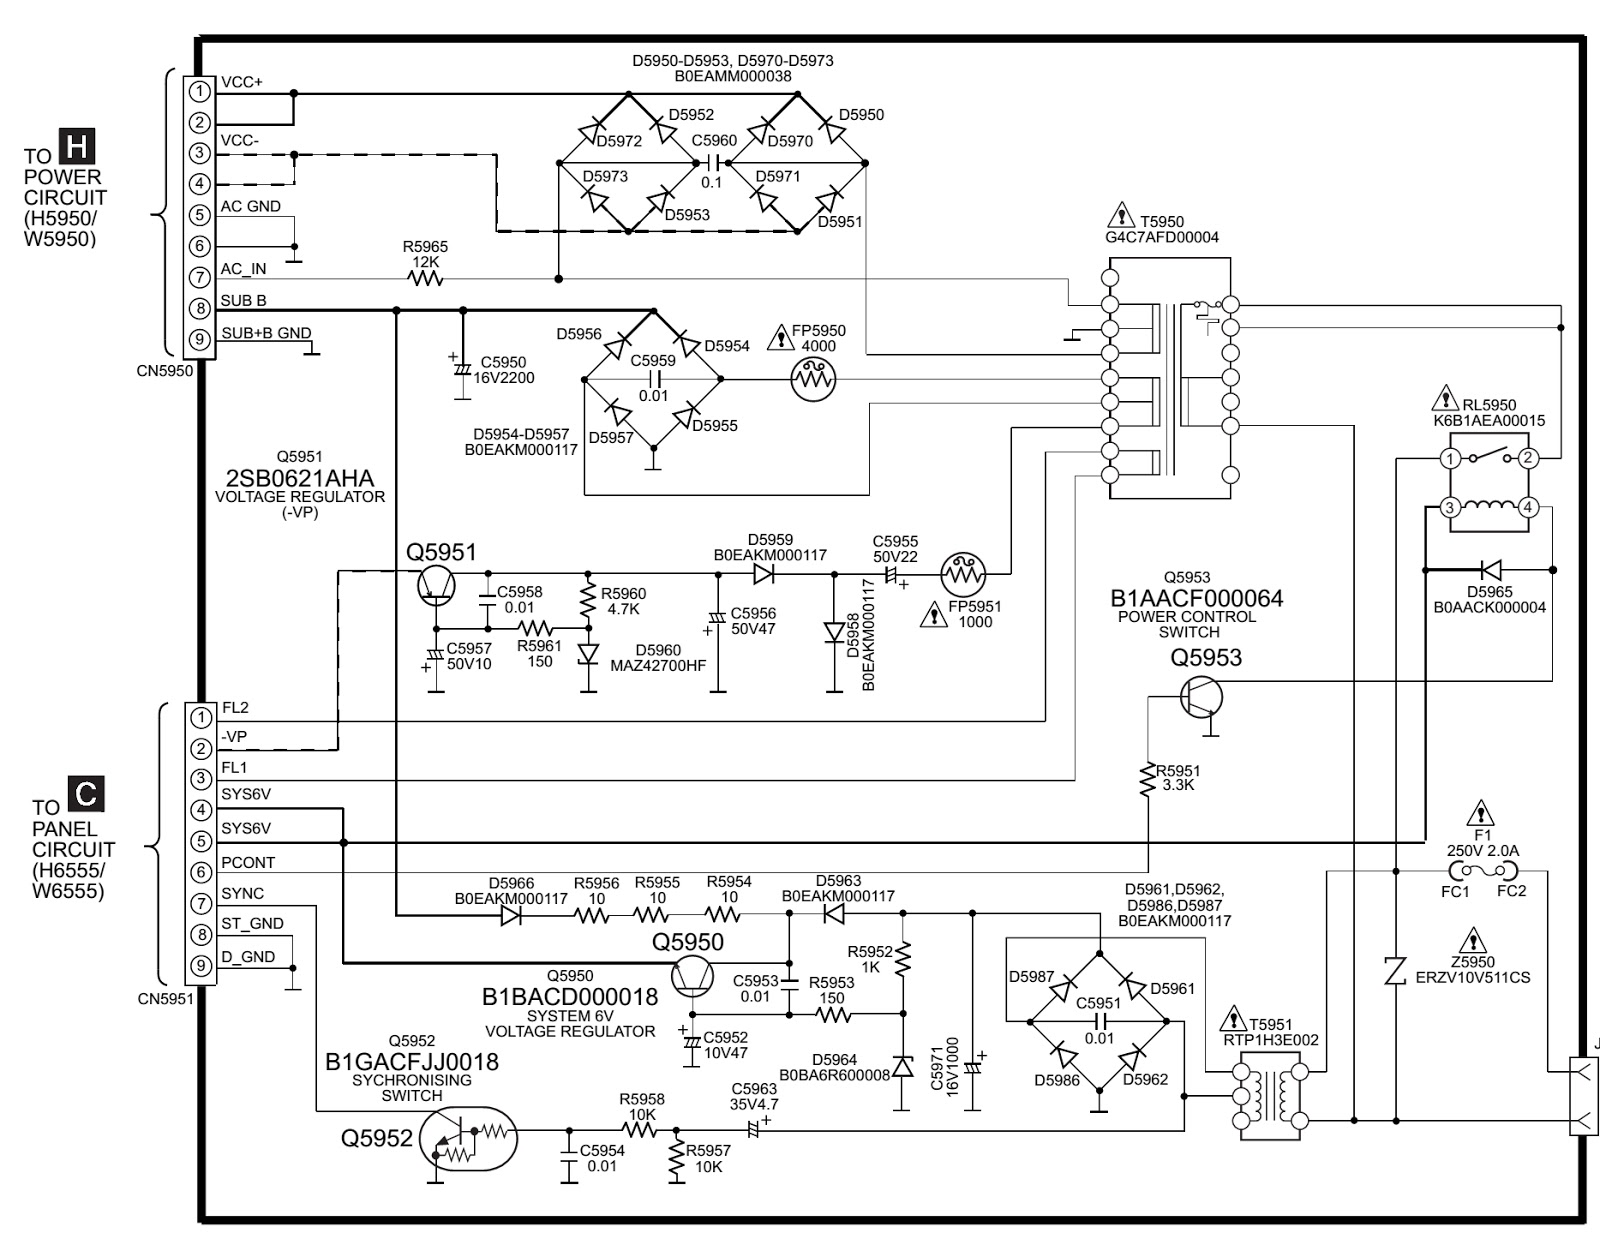 panasonic cu ps9nkz wiring diagrams wiring diagram panasonic amp wiring diagram [ 1600 x 1233 Pixel ]